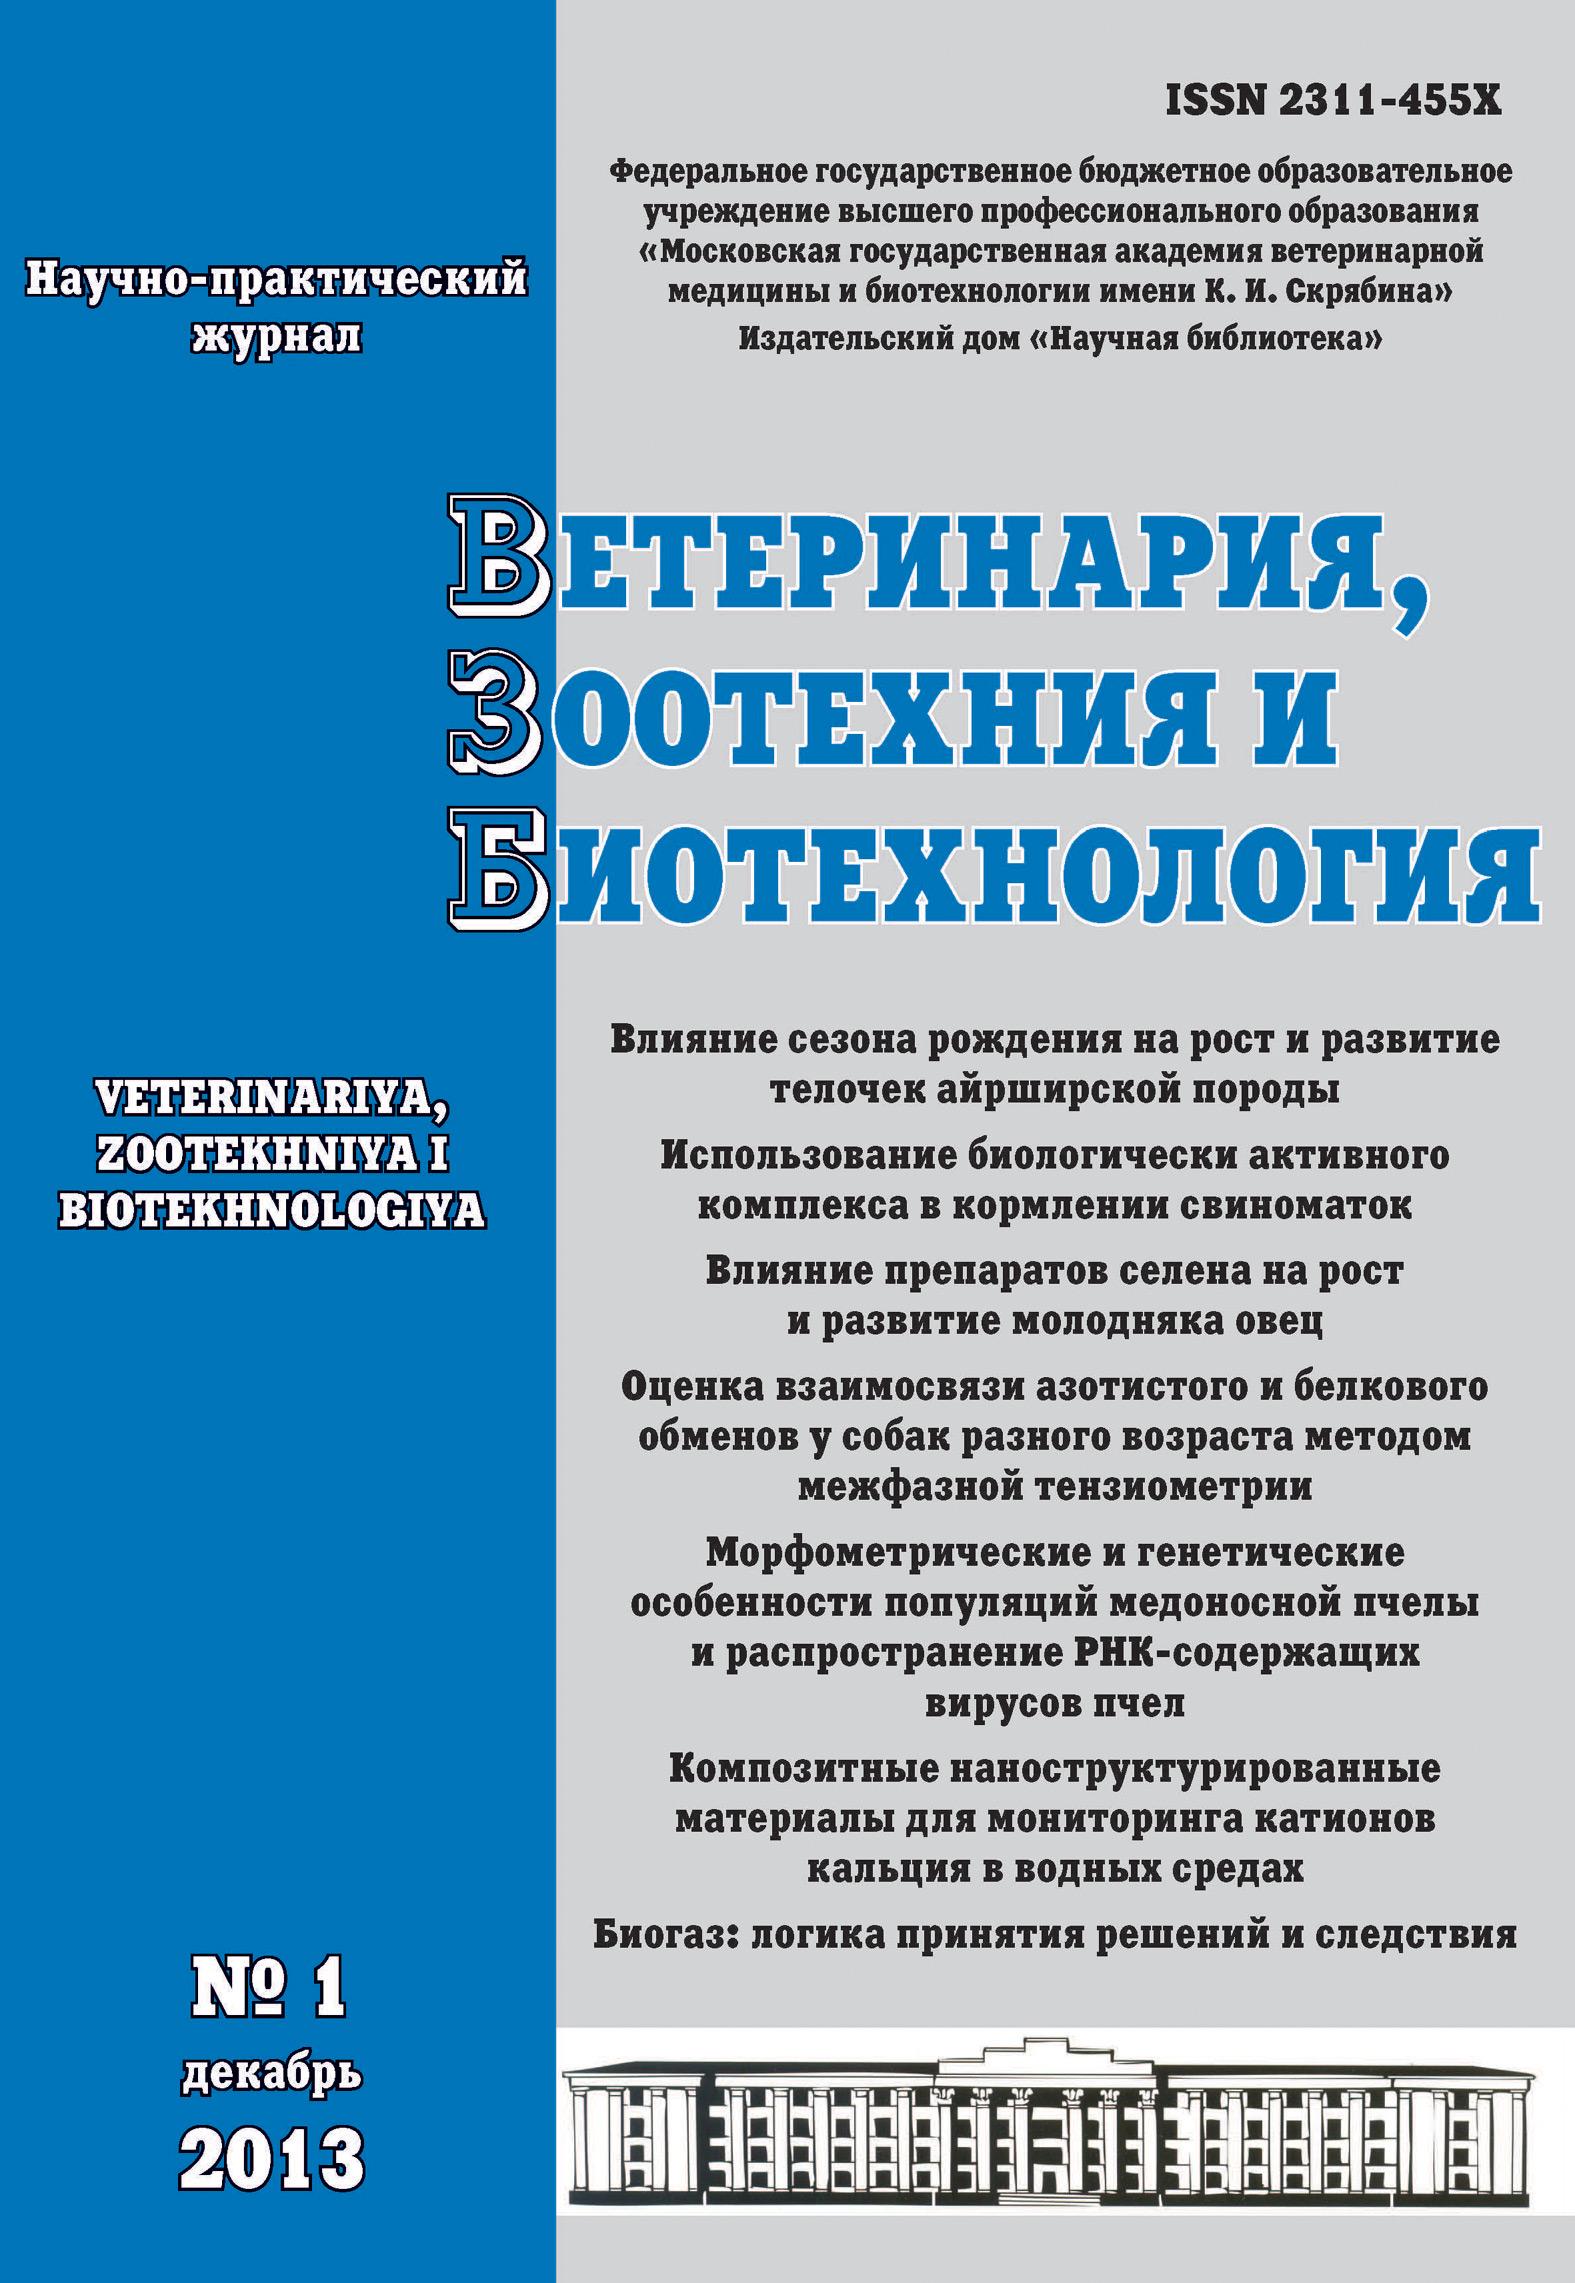 Ветеринария, зоотехния и биотехнология № 1 2013